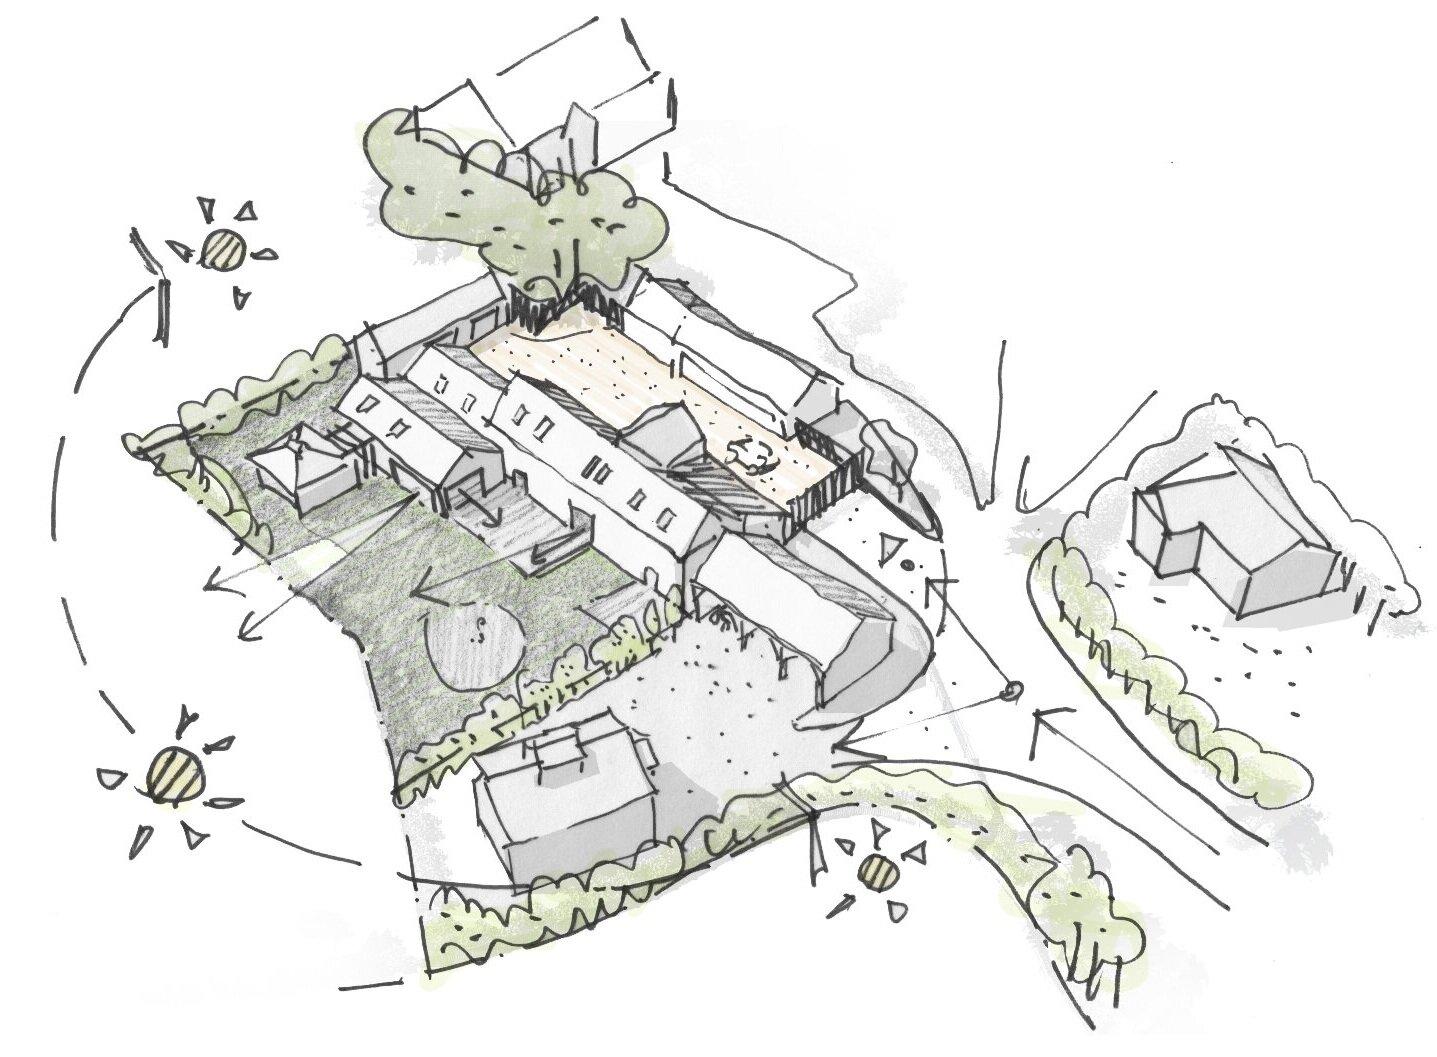 architect%2C+barn+conversion%2C+london%2C+handsketch